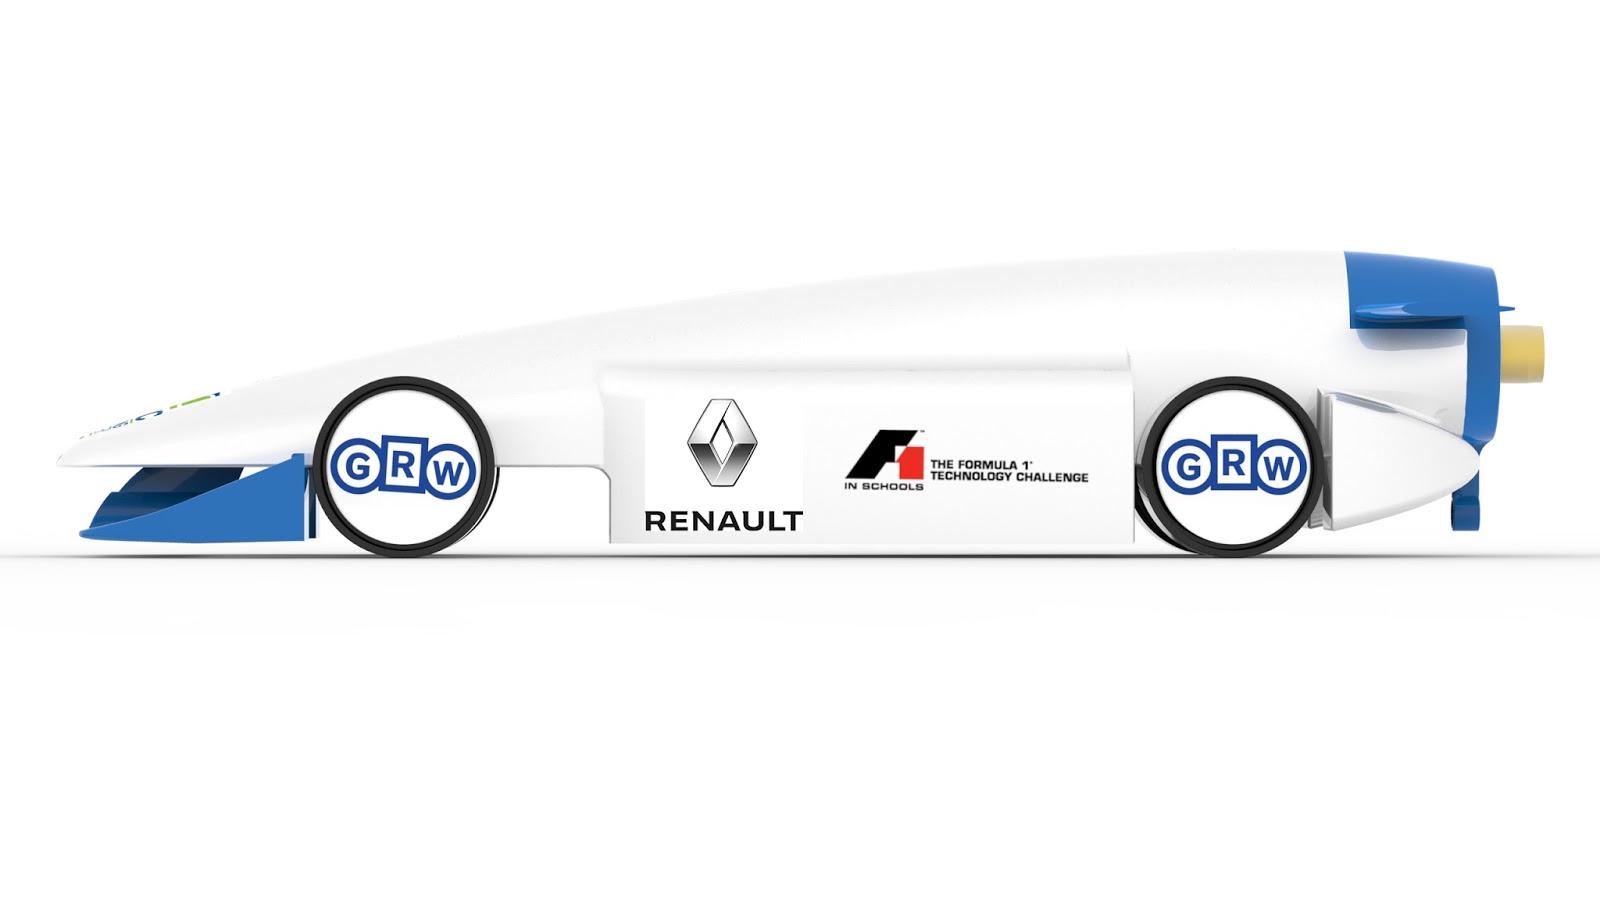 FULL2BPLAI r Μαθητές απ' όλο τον κόσμο δημιουργούν τις δικές τους ομάδες στα πρότυπα της F1 F1, Renault, videos, Τεχνολογία